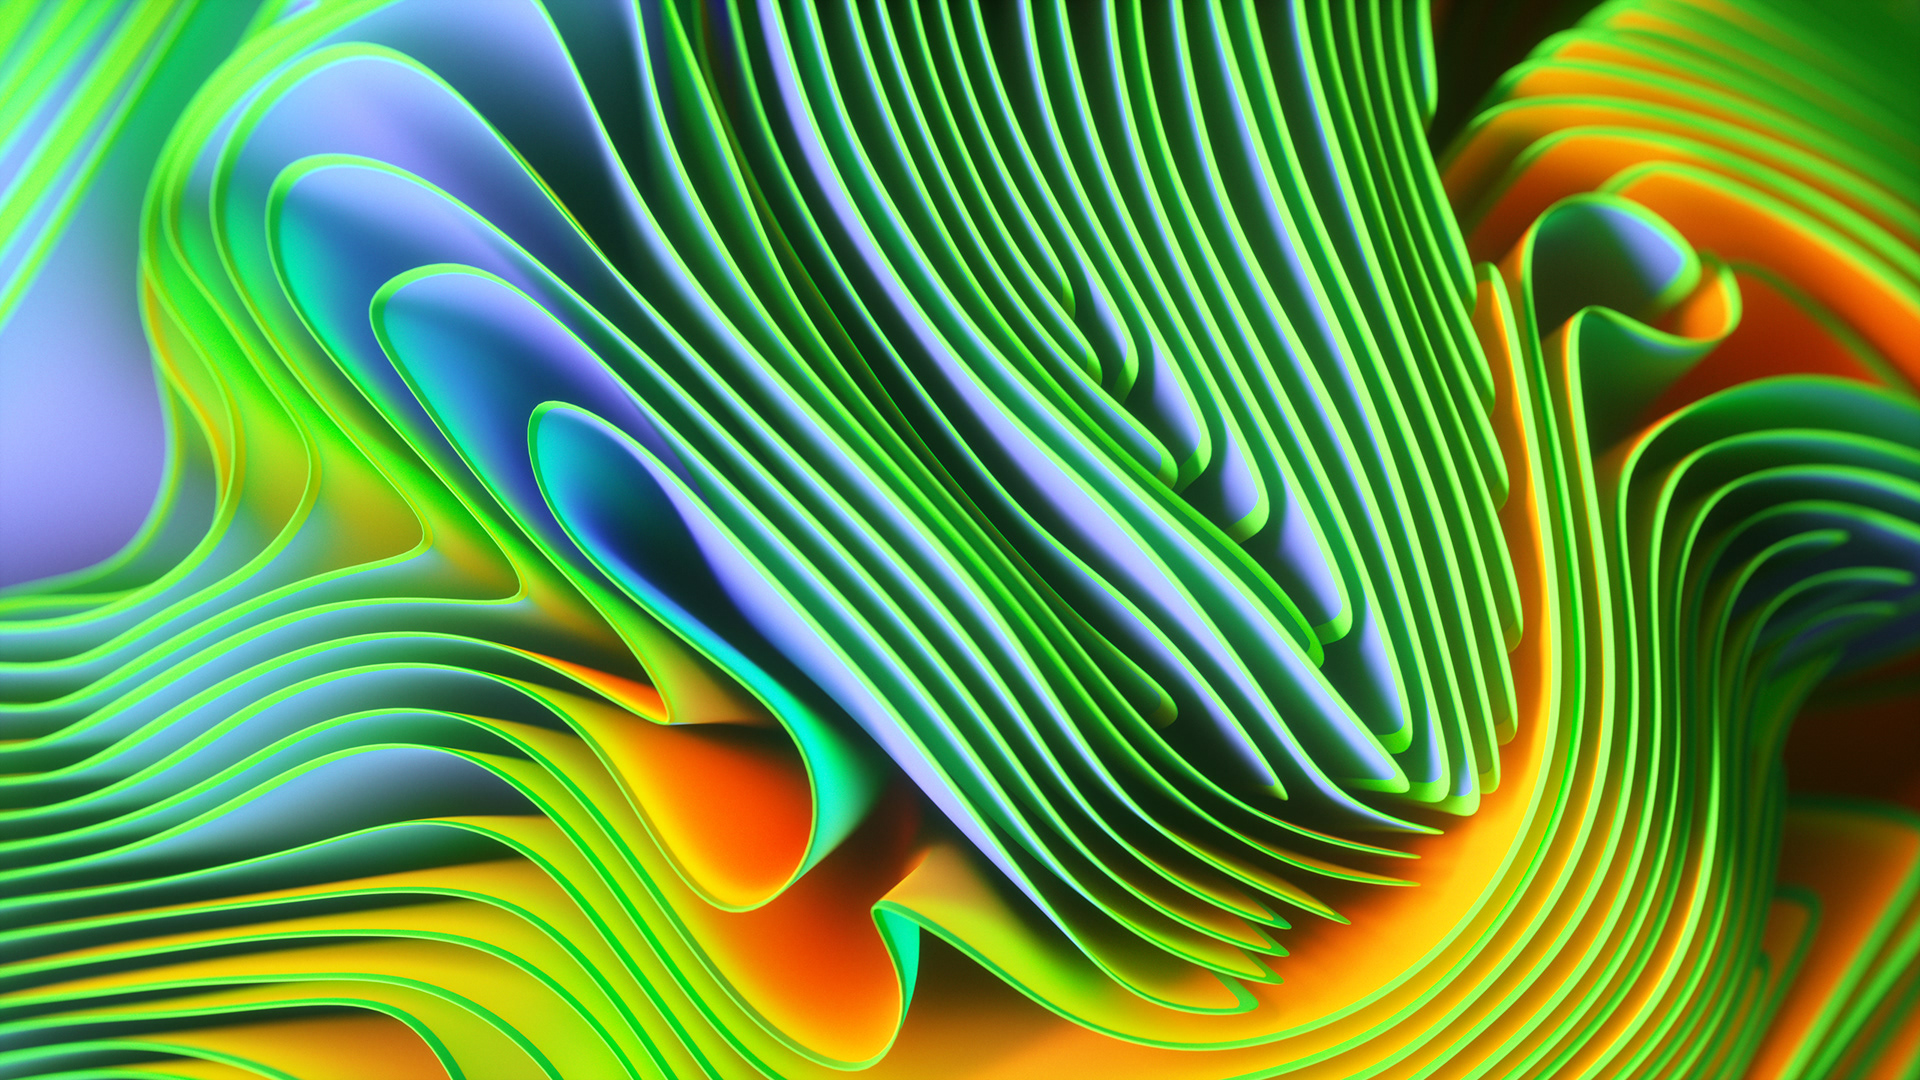 Twirl_01_01-1